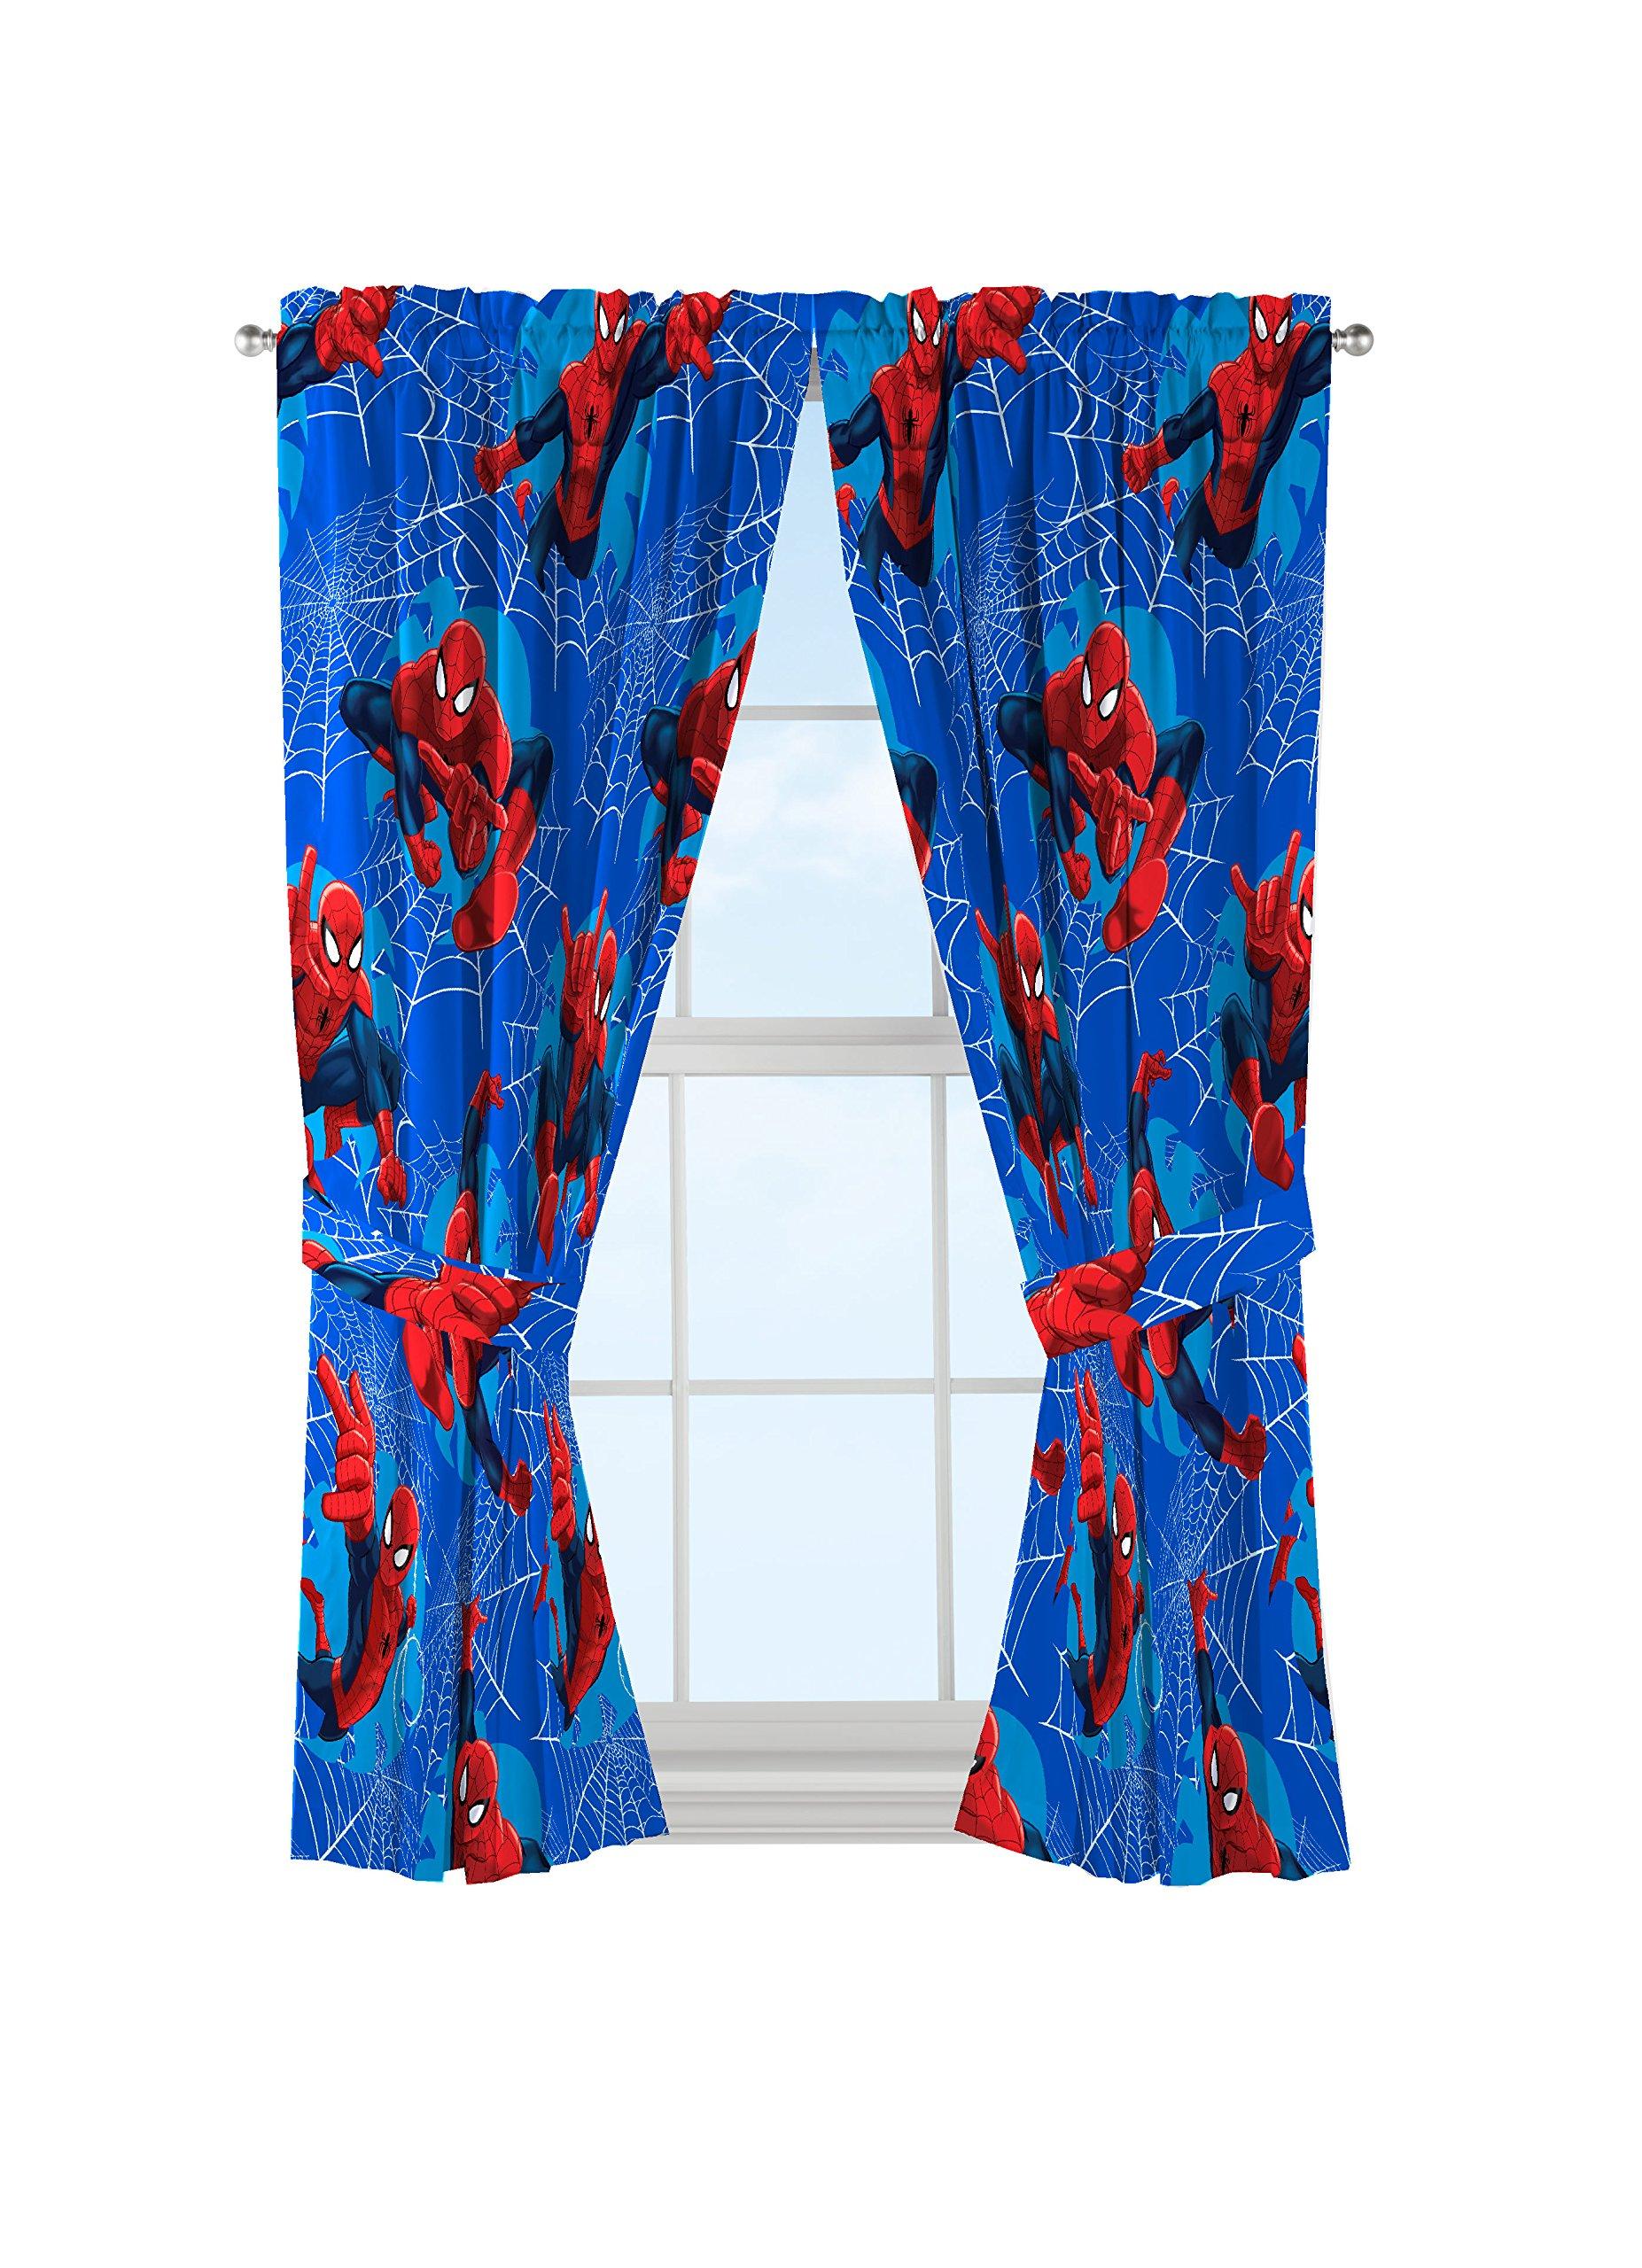 Marvel Spiderman Astonish 63' Window Drapery/Curtain 4pc Set (2 Panels, 2 Tie backs)